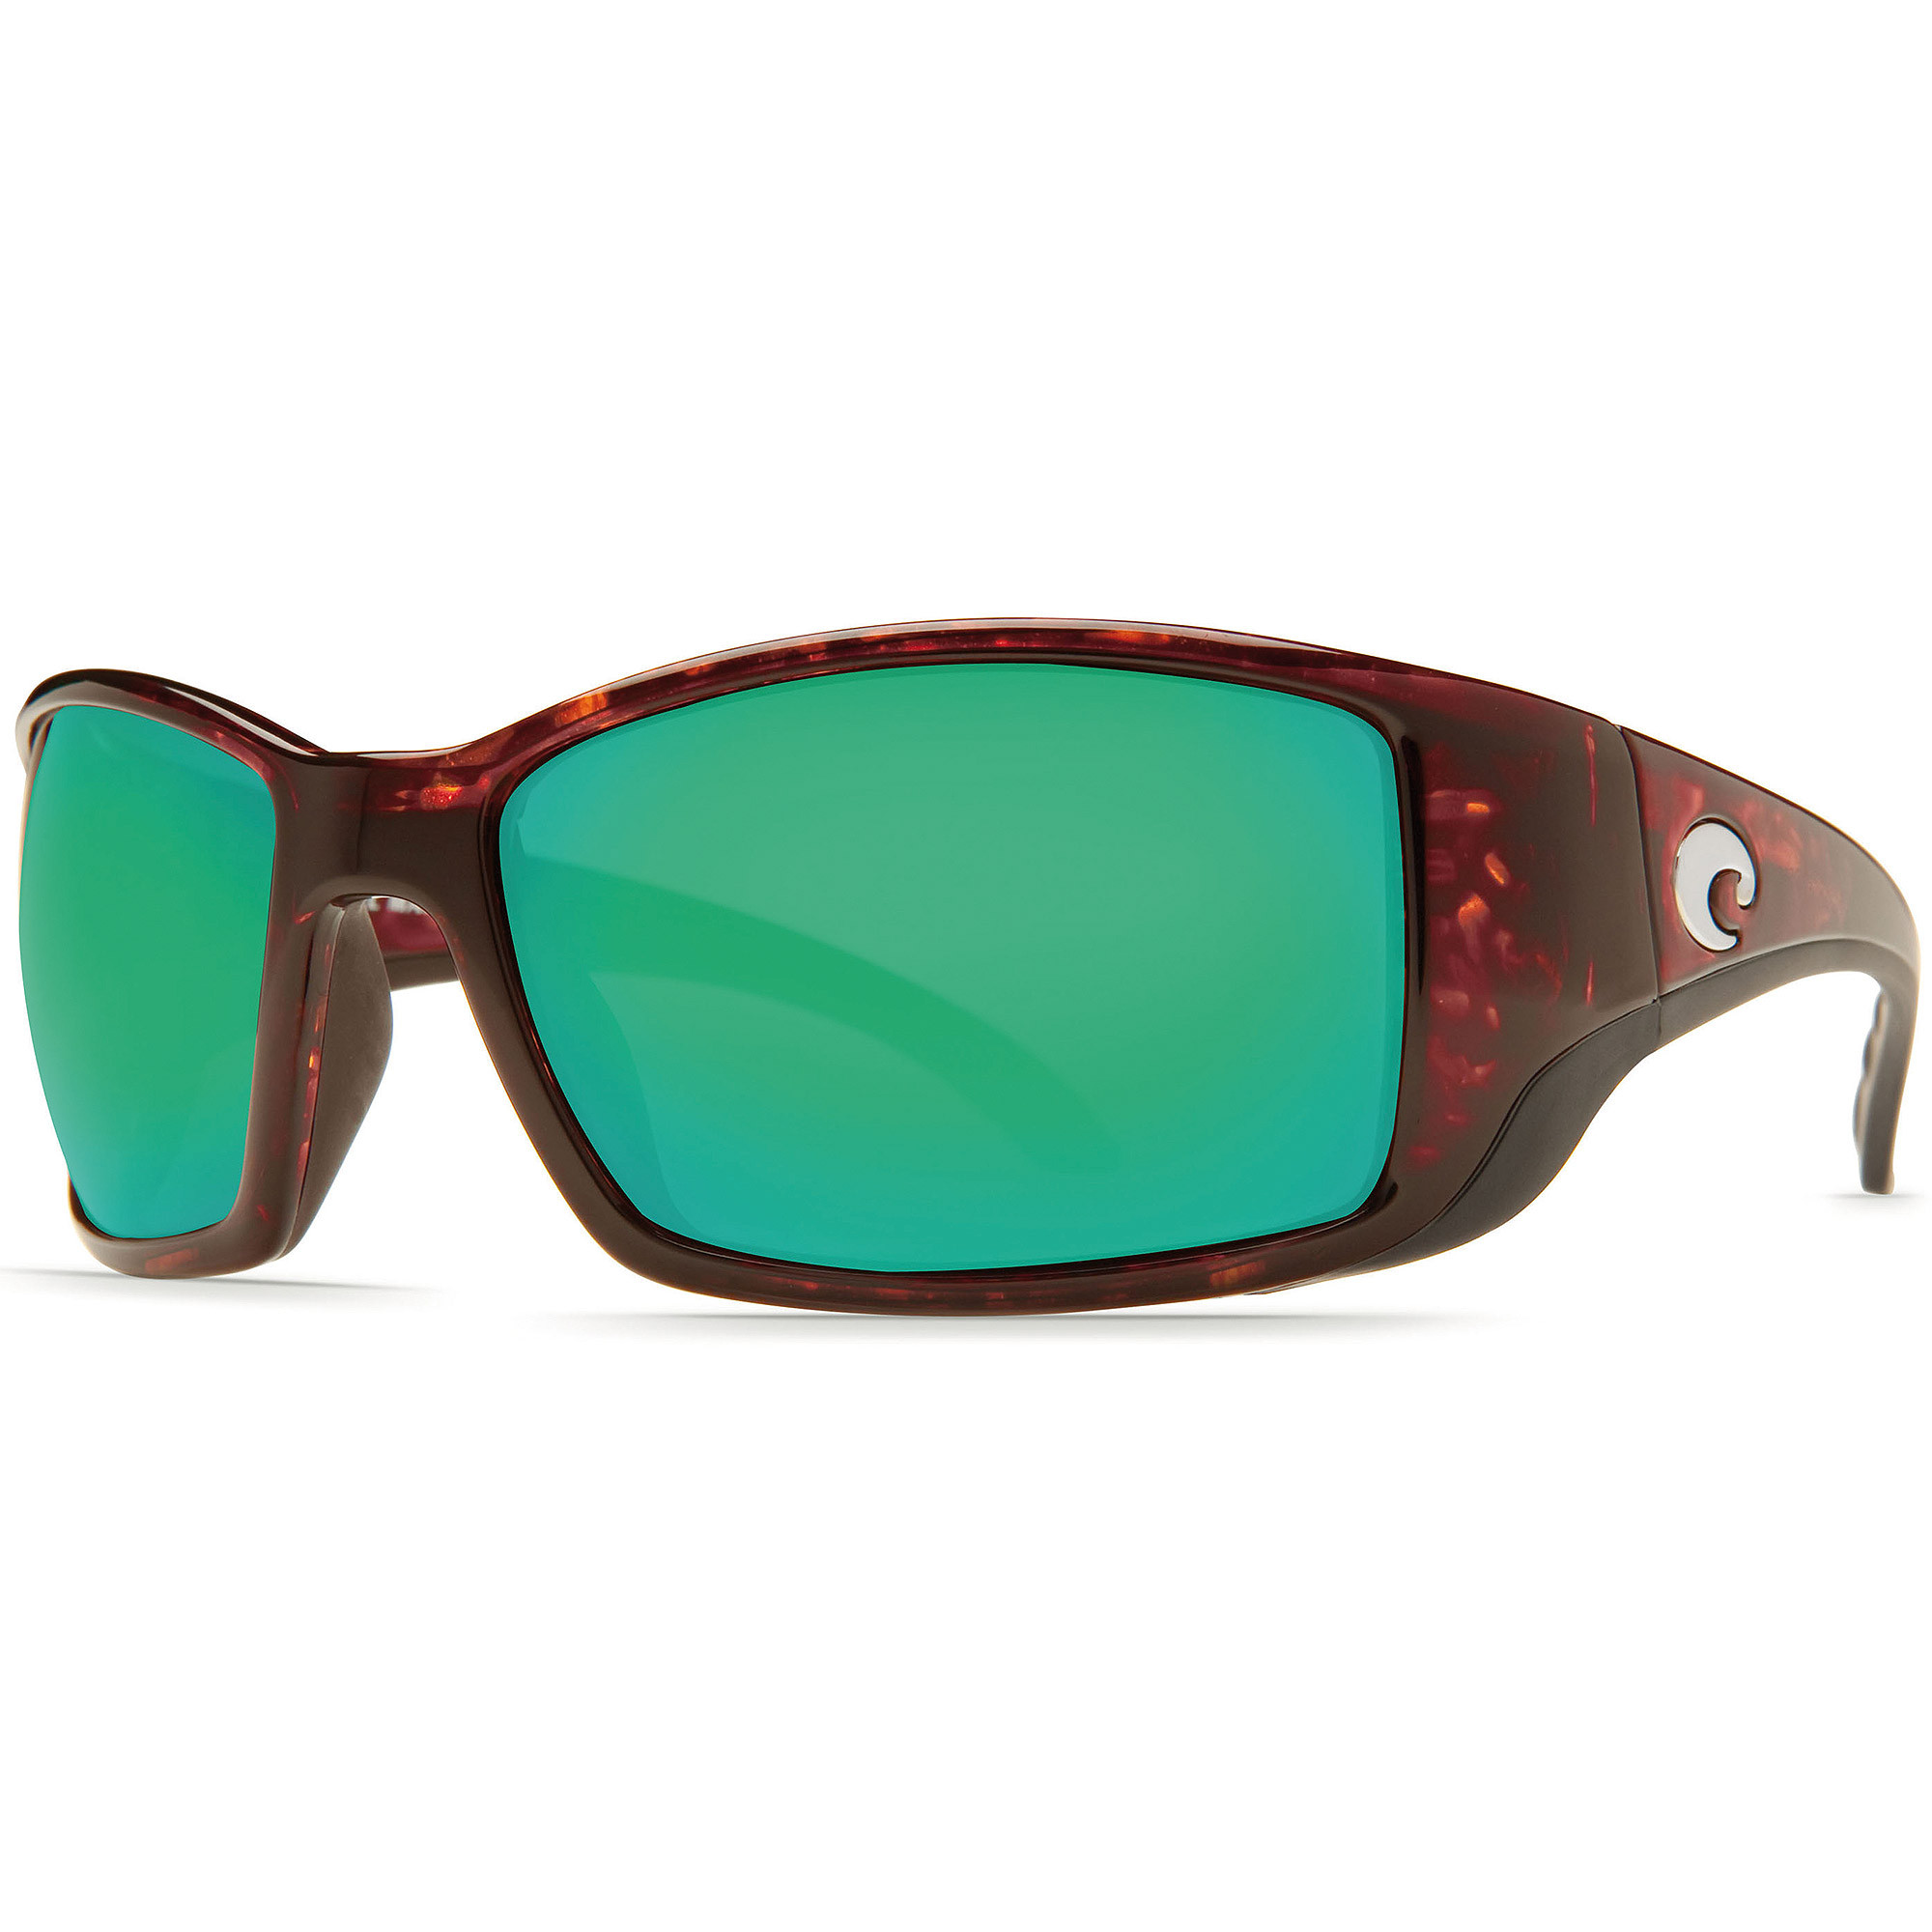 Costa Blackfin Polarisationsbrille | flyfishingeurope-shop.de